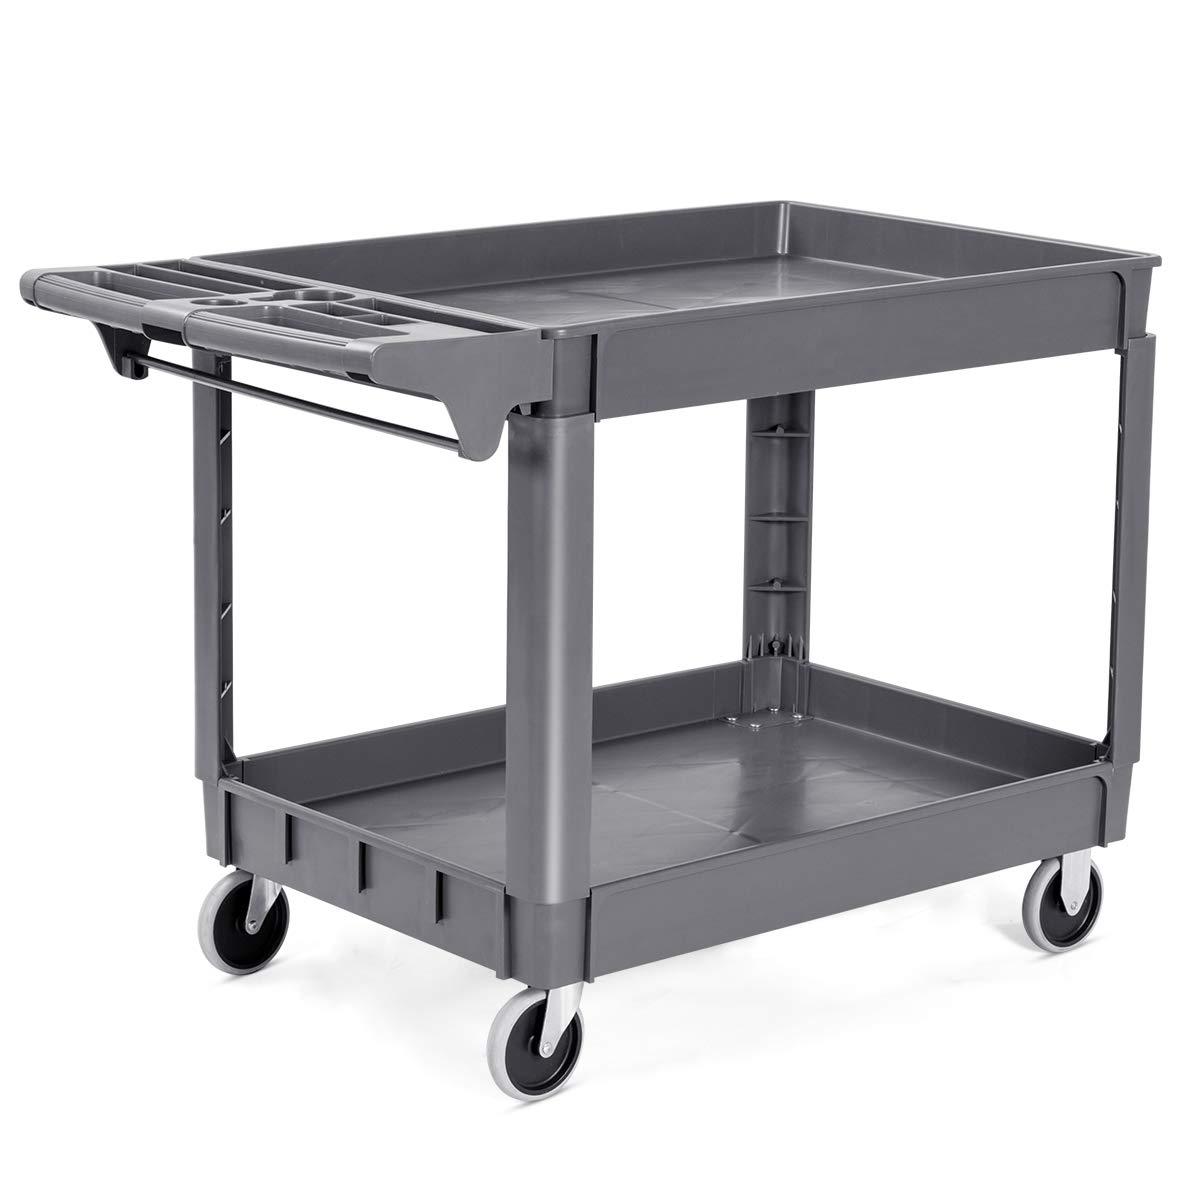 "Goplus Plastic Service Cart Utility Storage Cart for All Purpose 550 LBS Capacity (2 Shelves 46"" x 25"" x 33"")"